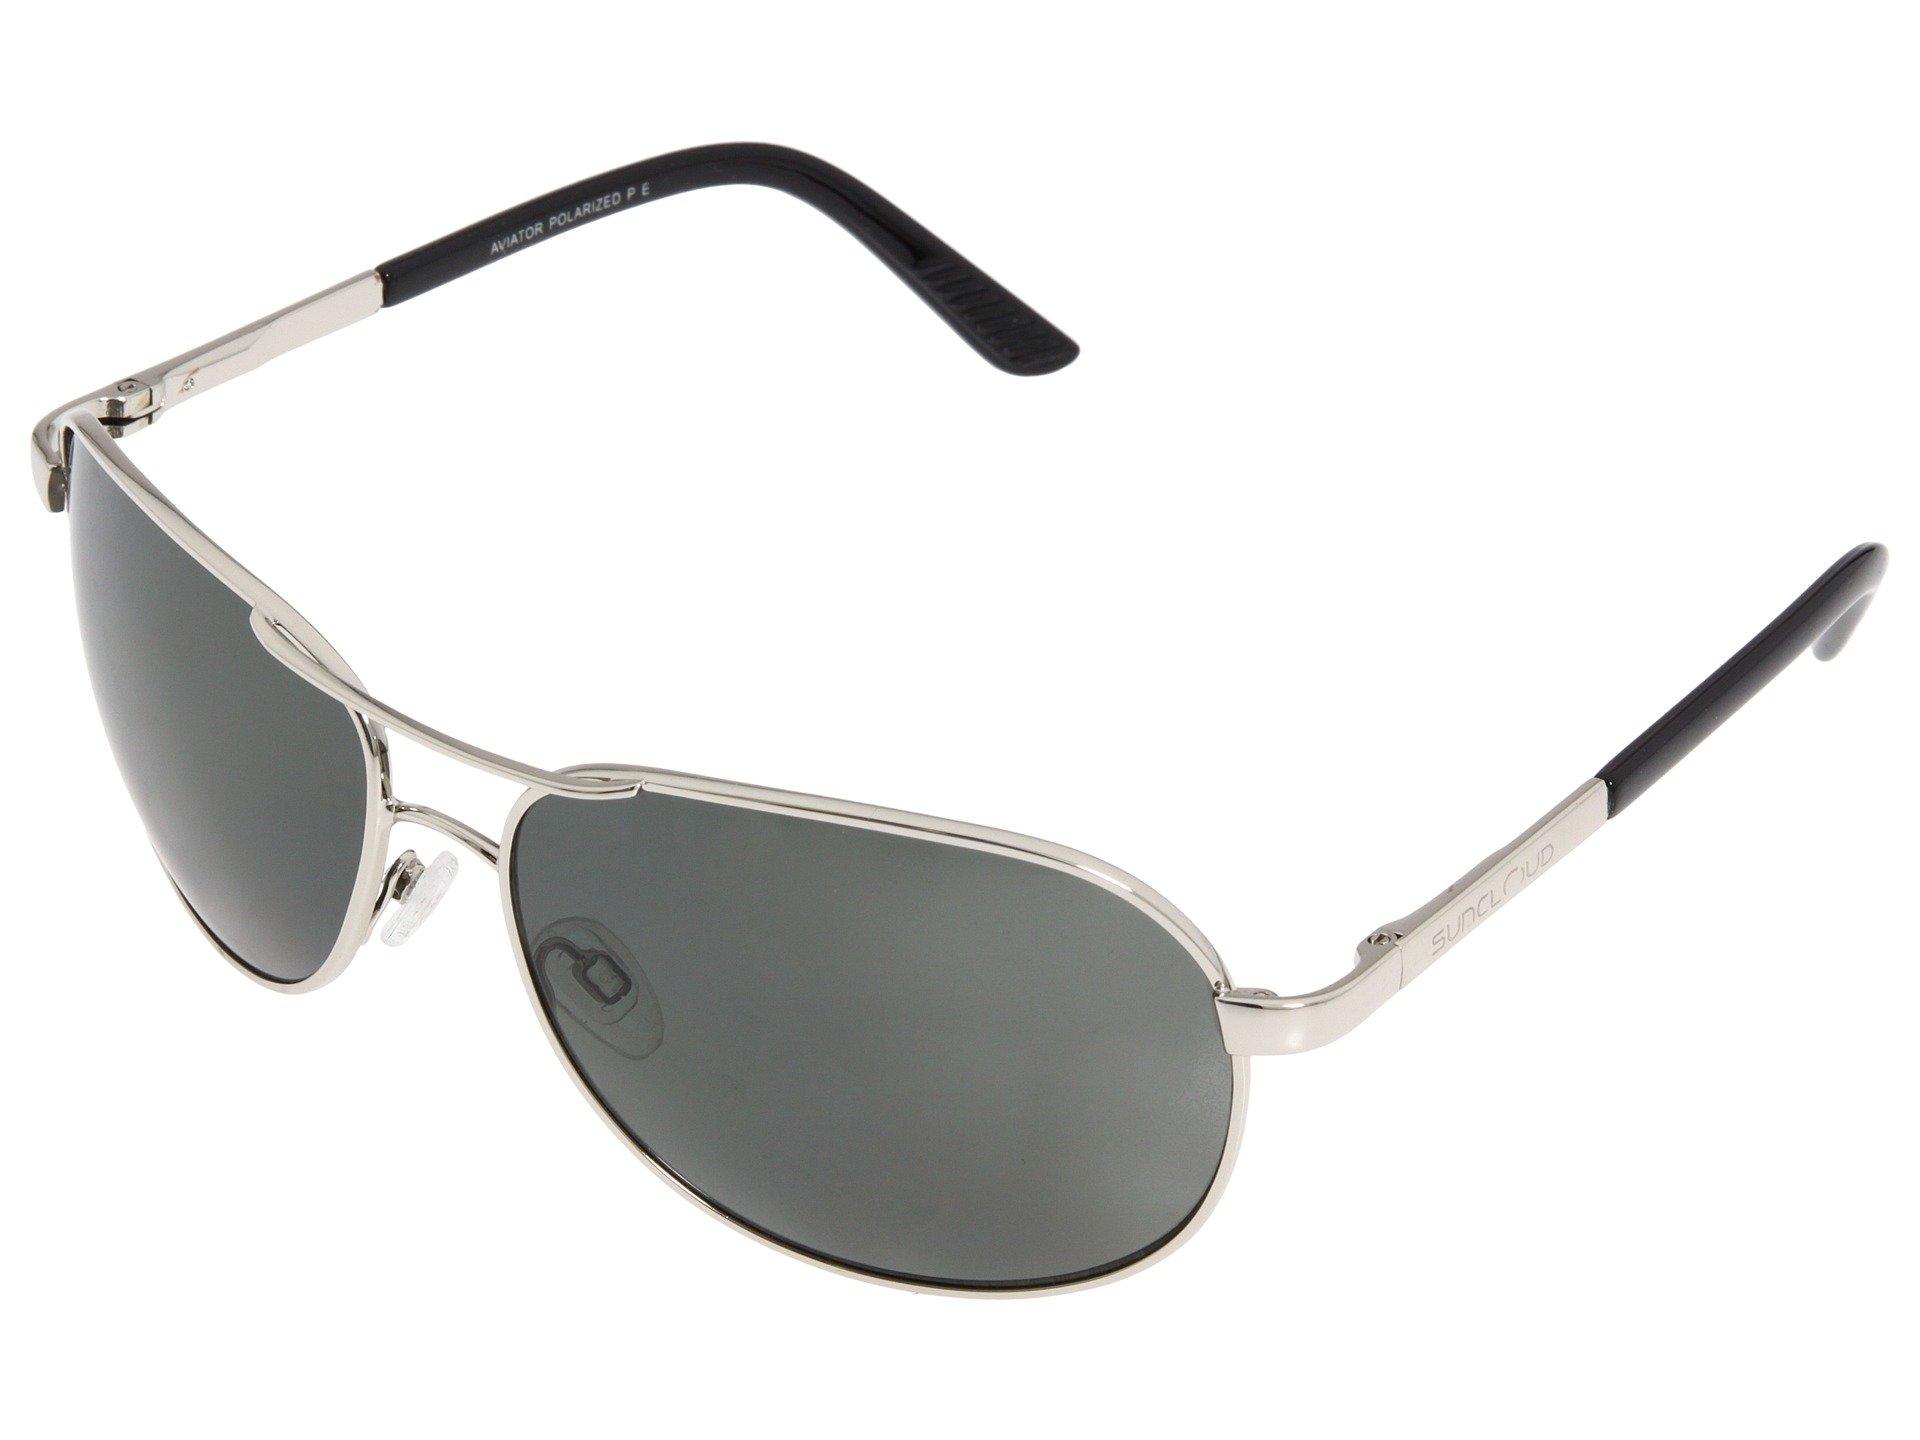 0ad3d398d1 Suncloud Patrol Sunglasses Review